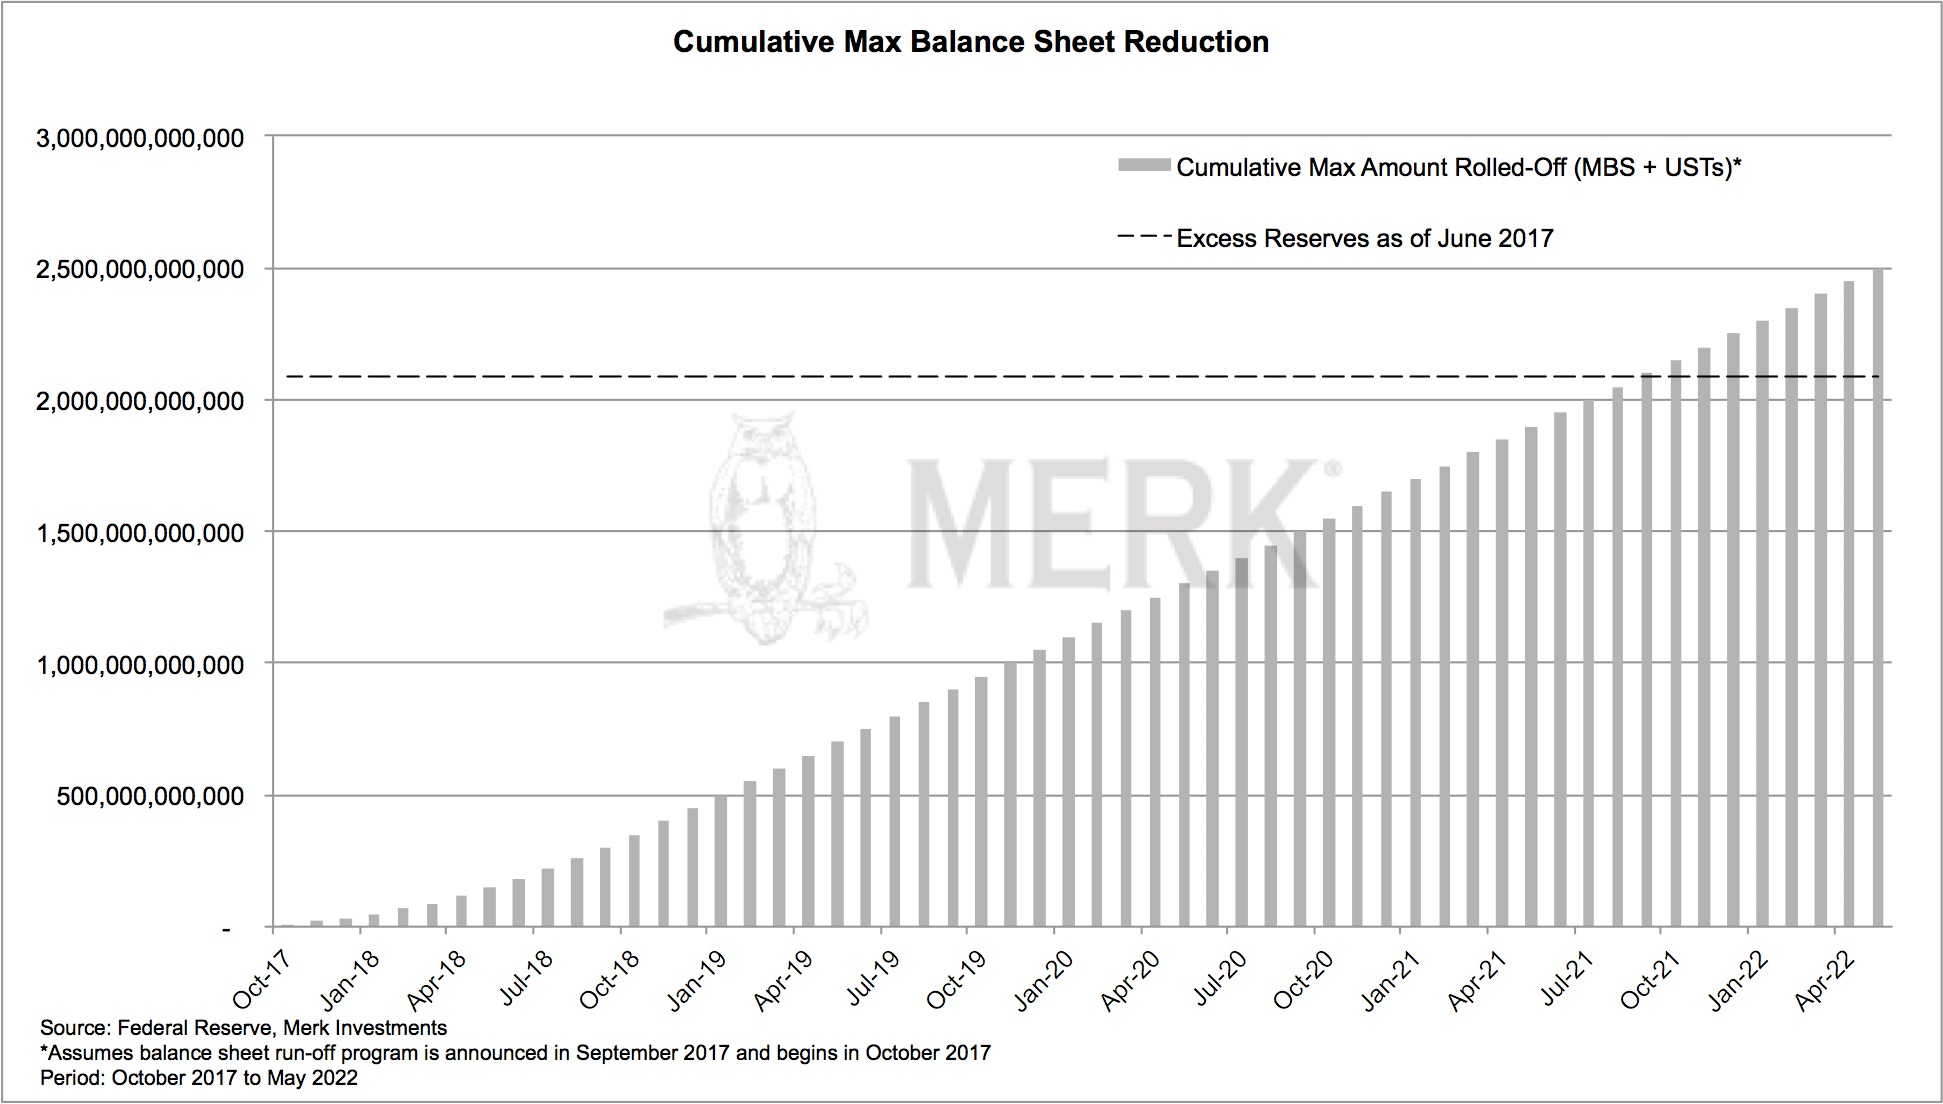 Cumulative Max Balance-Sheet Reduction